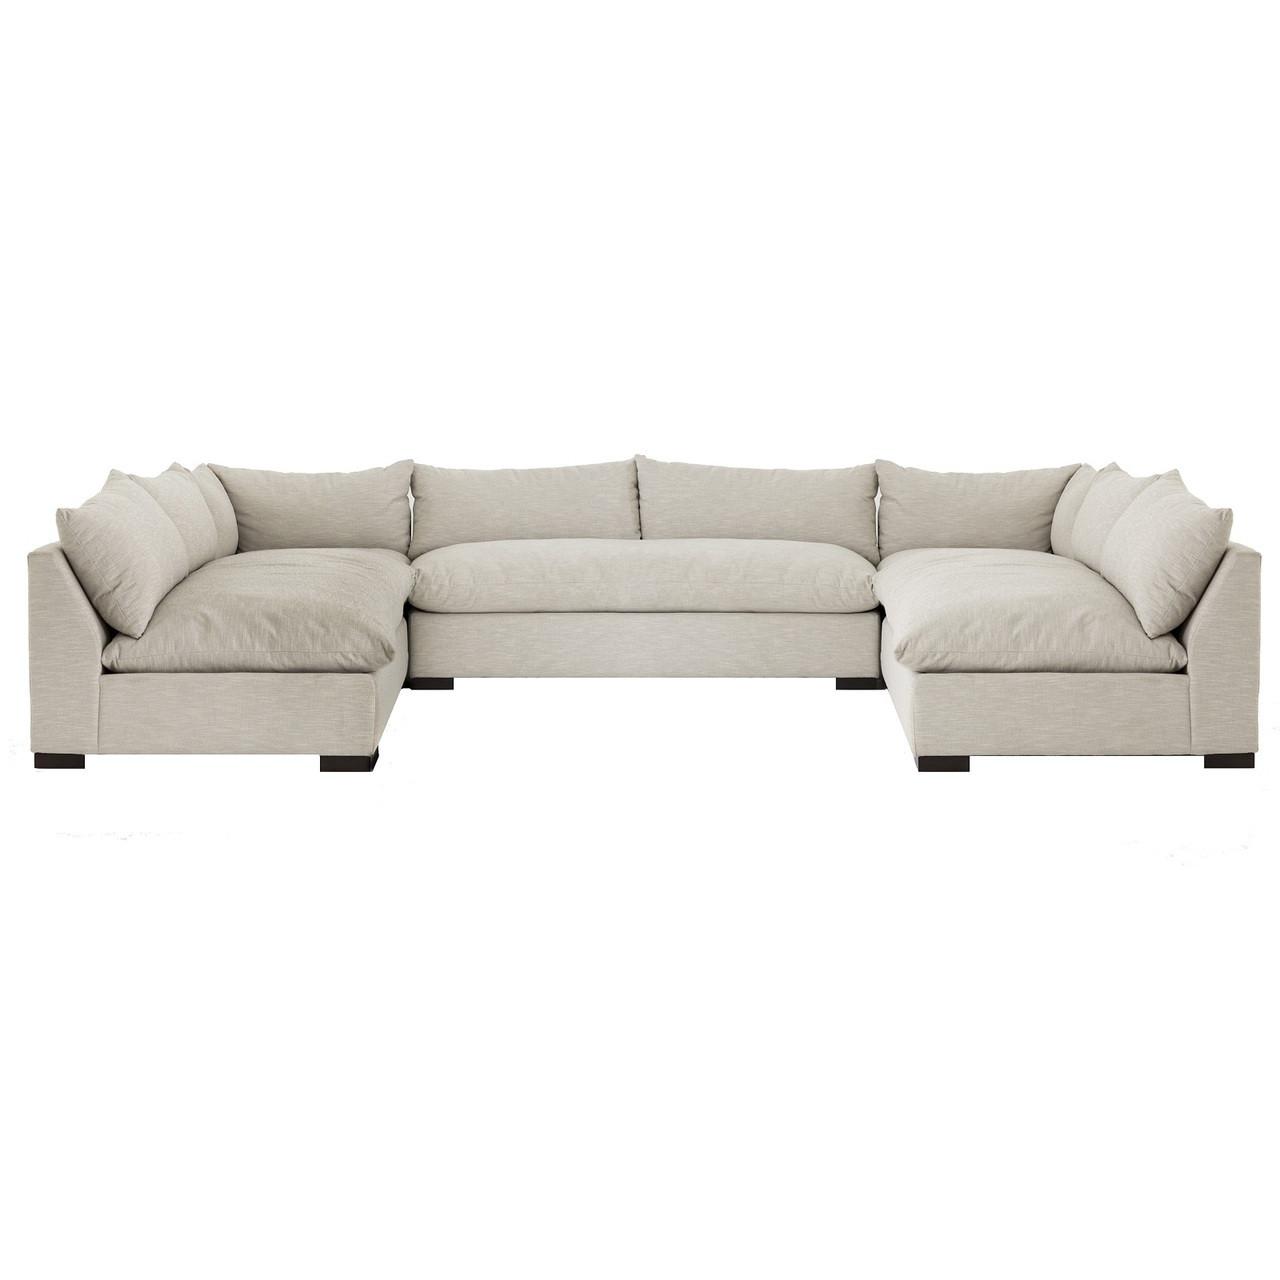 "Grant Modern Charcoal Grey Armless Corner Sectional: Grant Modern Oatmeal 5-Piece Armless ""U"" Sectional Sofa"